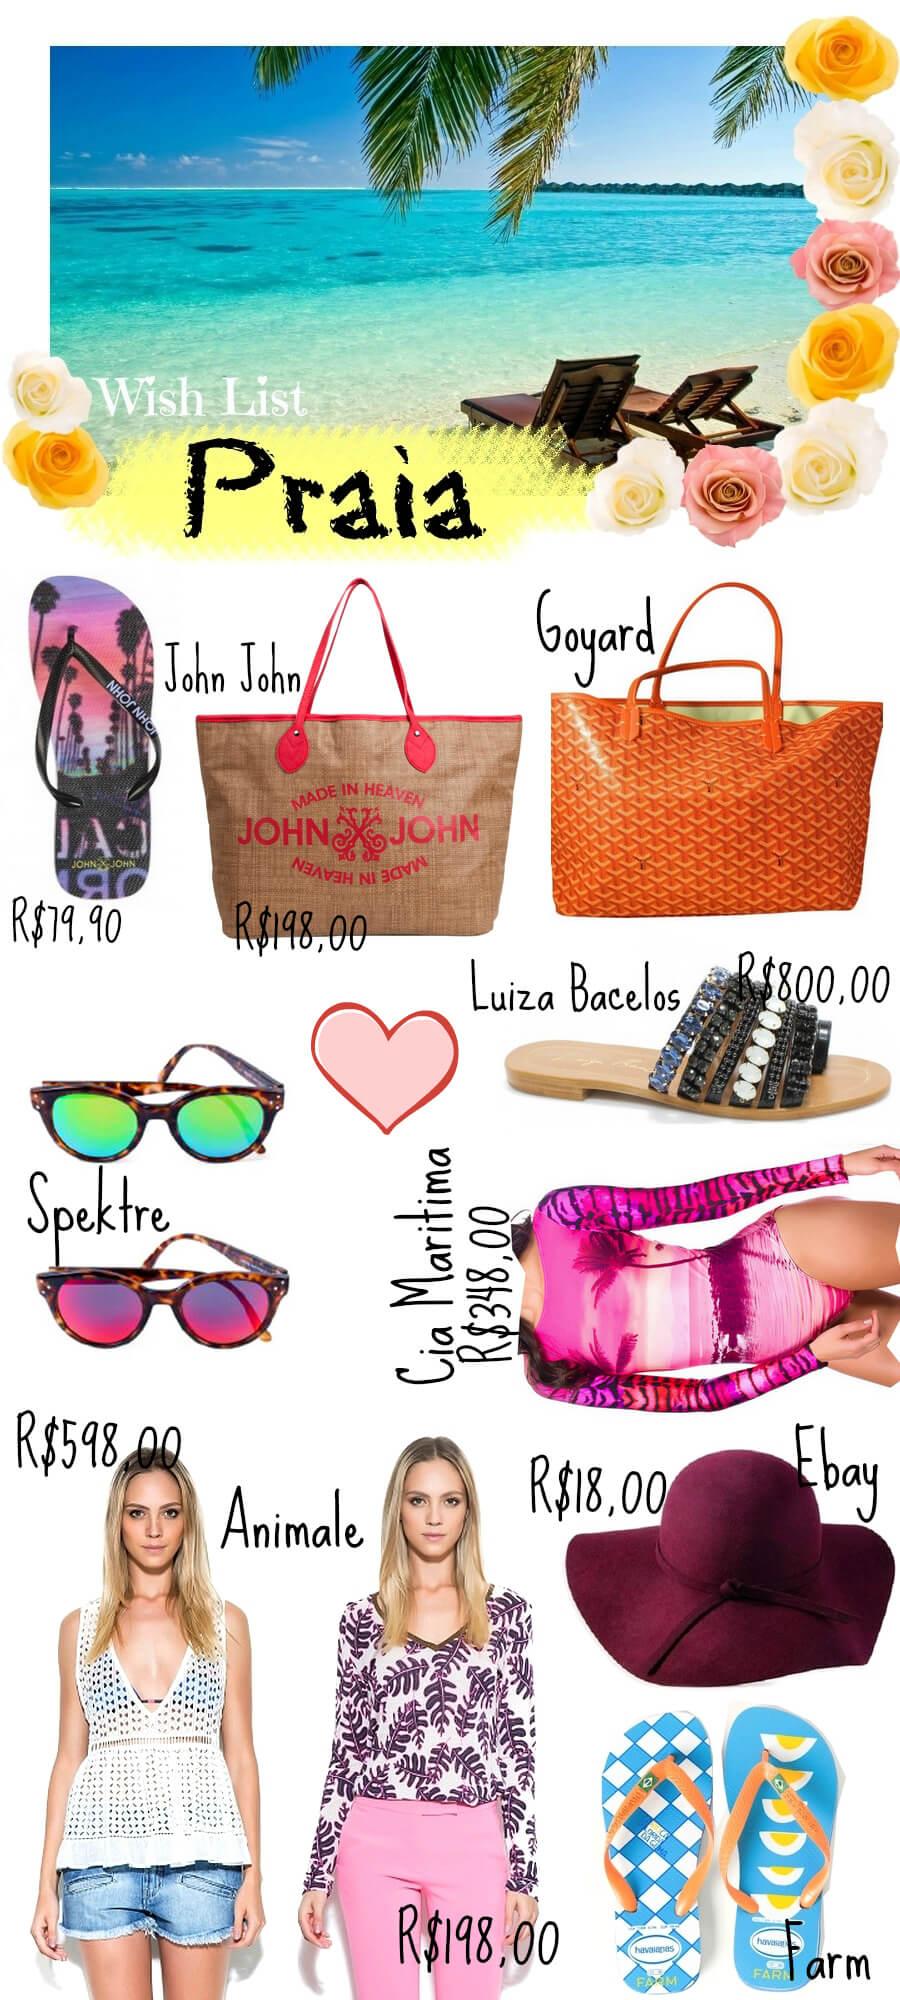 wish-list-verao-cia-maritima-body-bikine-goyard-johnnjohn-bolsa-luiza-barcelos-rasteirinha-moda-praia-tendencia-beach-2015-animale-roupas